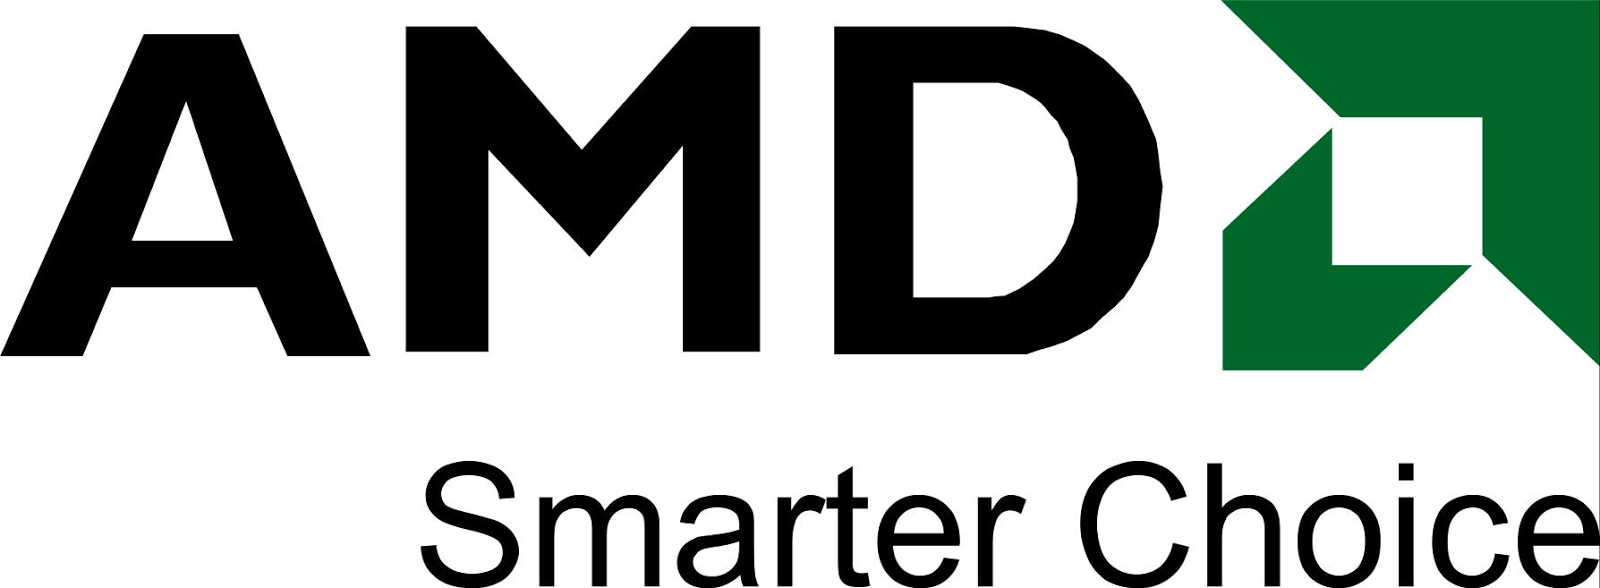 Http Fresherswish Blogspot In 2013 10 Amd Recruiting Freshers For Design Html Logos Amd Dhl Logo